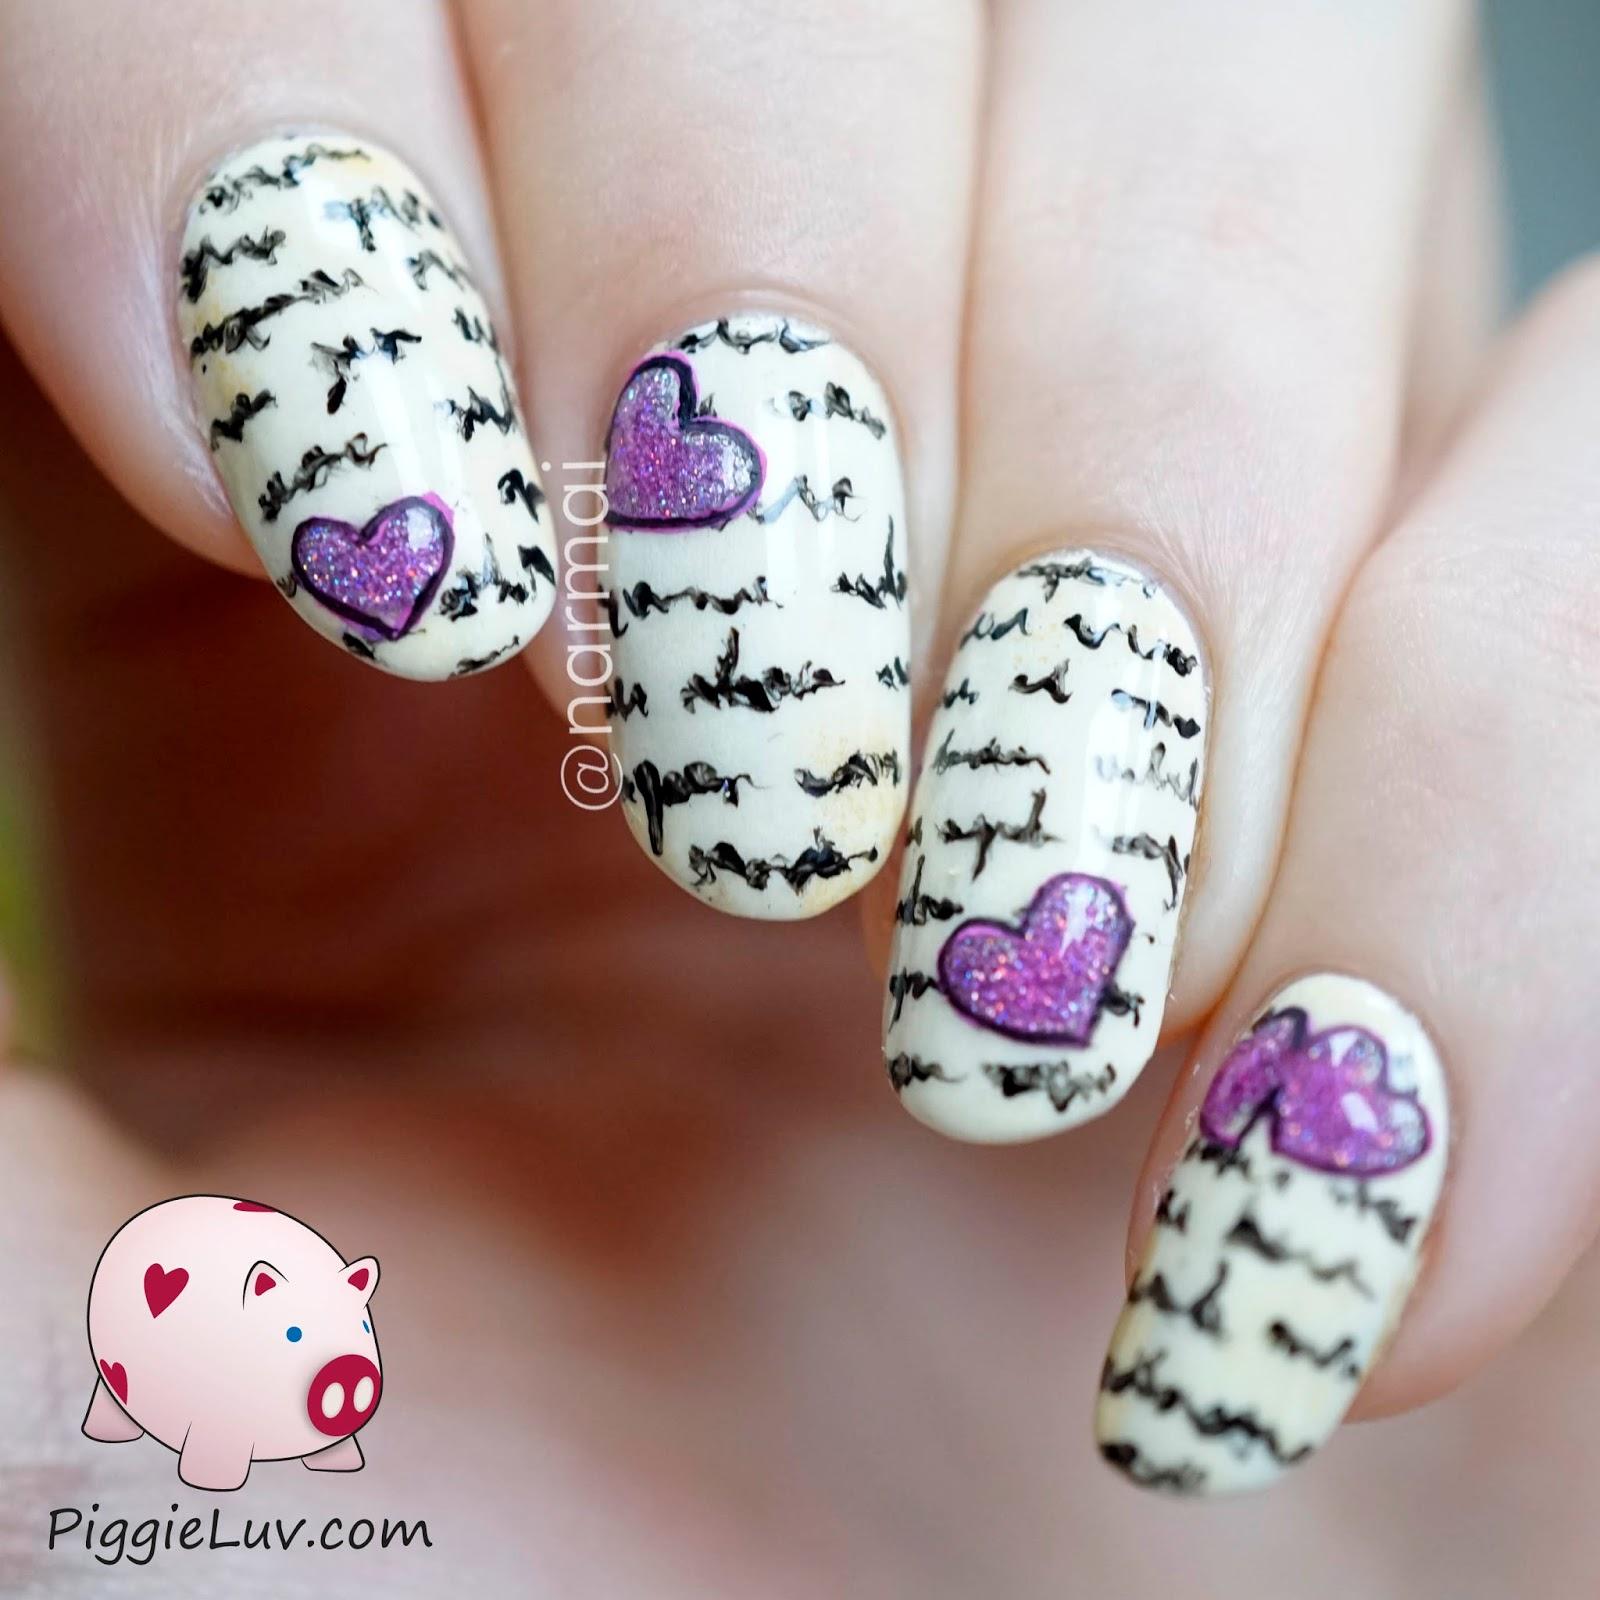 piggieluv: love letter nail art - hpb valentine's day linkup